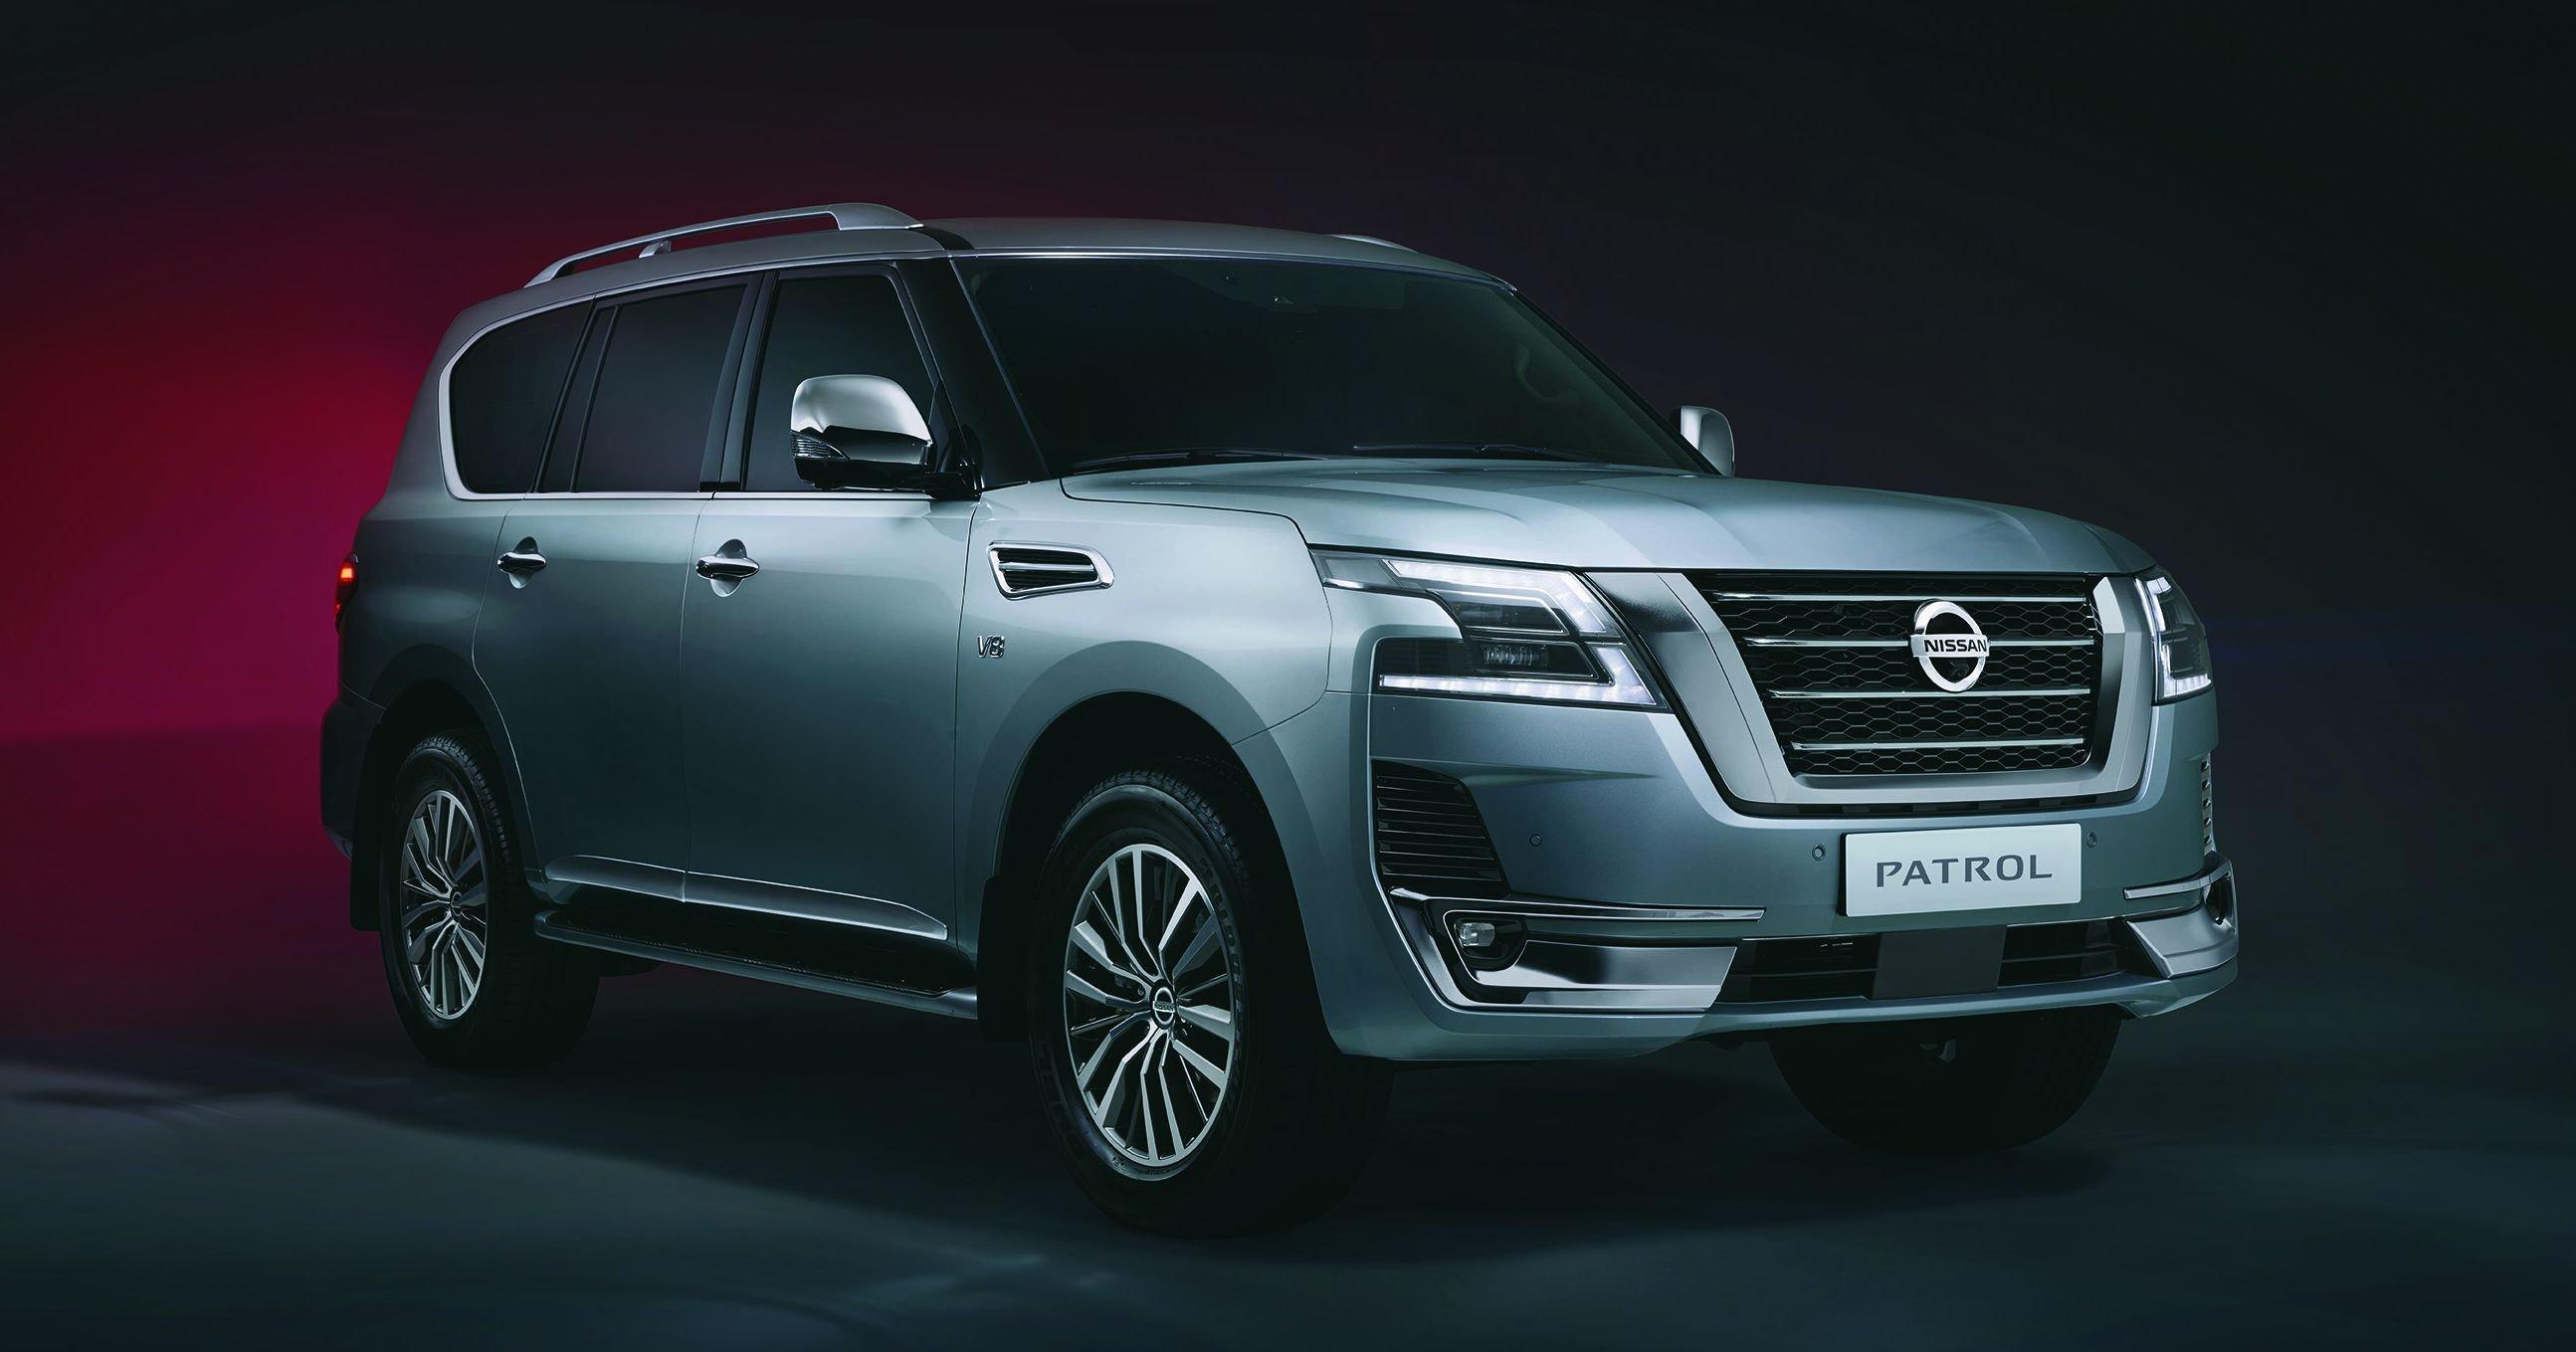 2020 Nissan Patrol Facelift 4 0l V6 And 5 6l V8 Carplay Android Aeb Hydraulic Body Motion Control Paultan Org